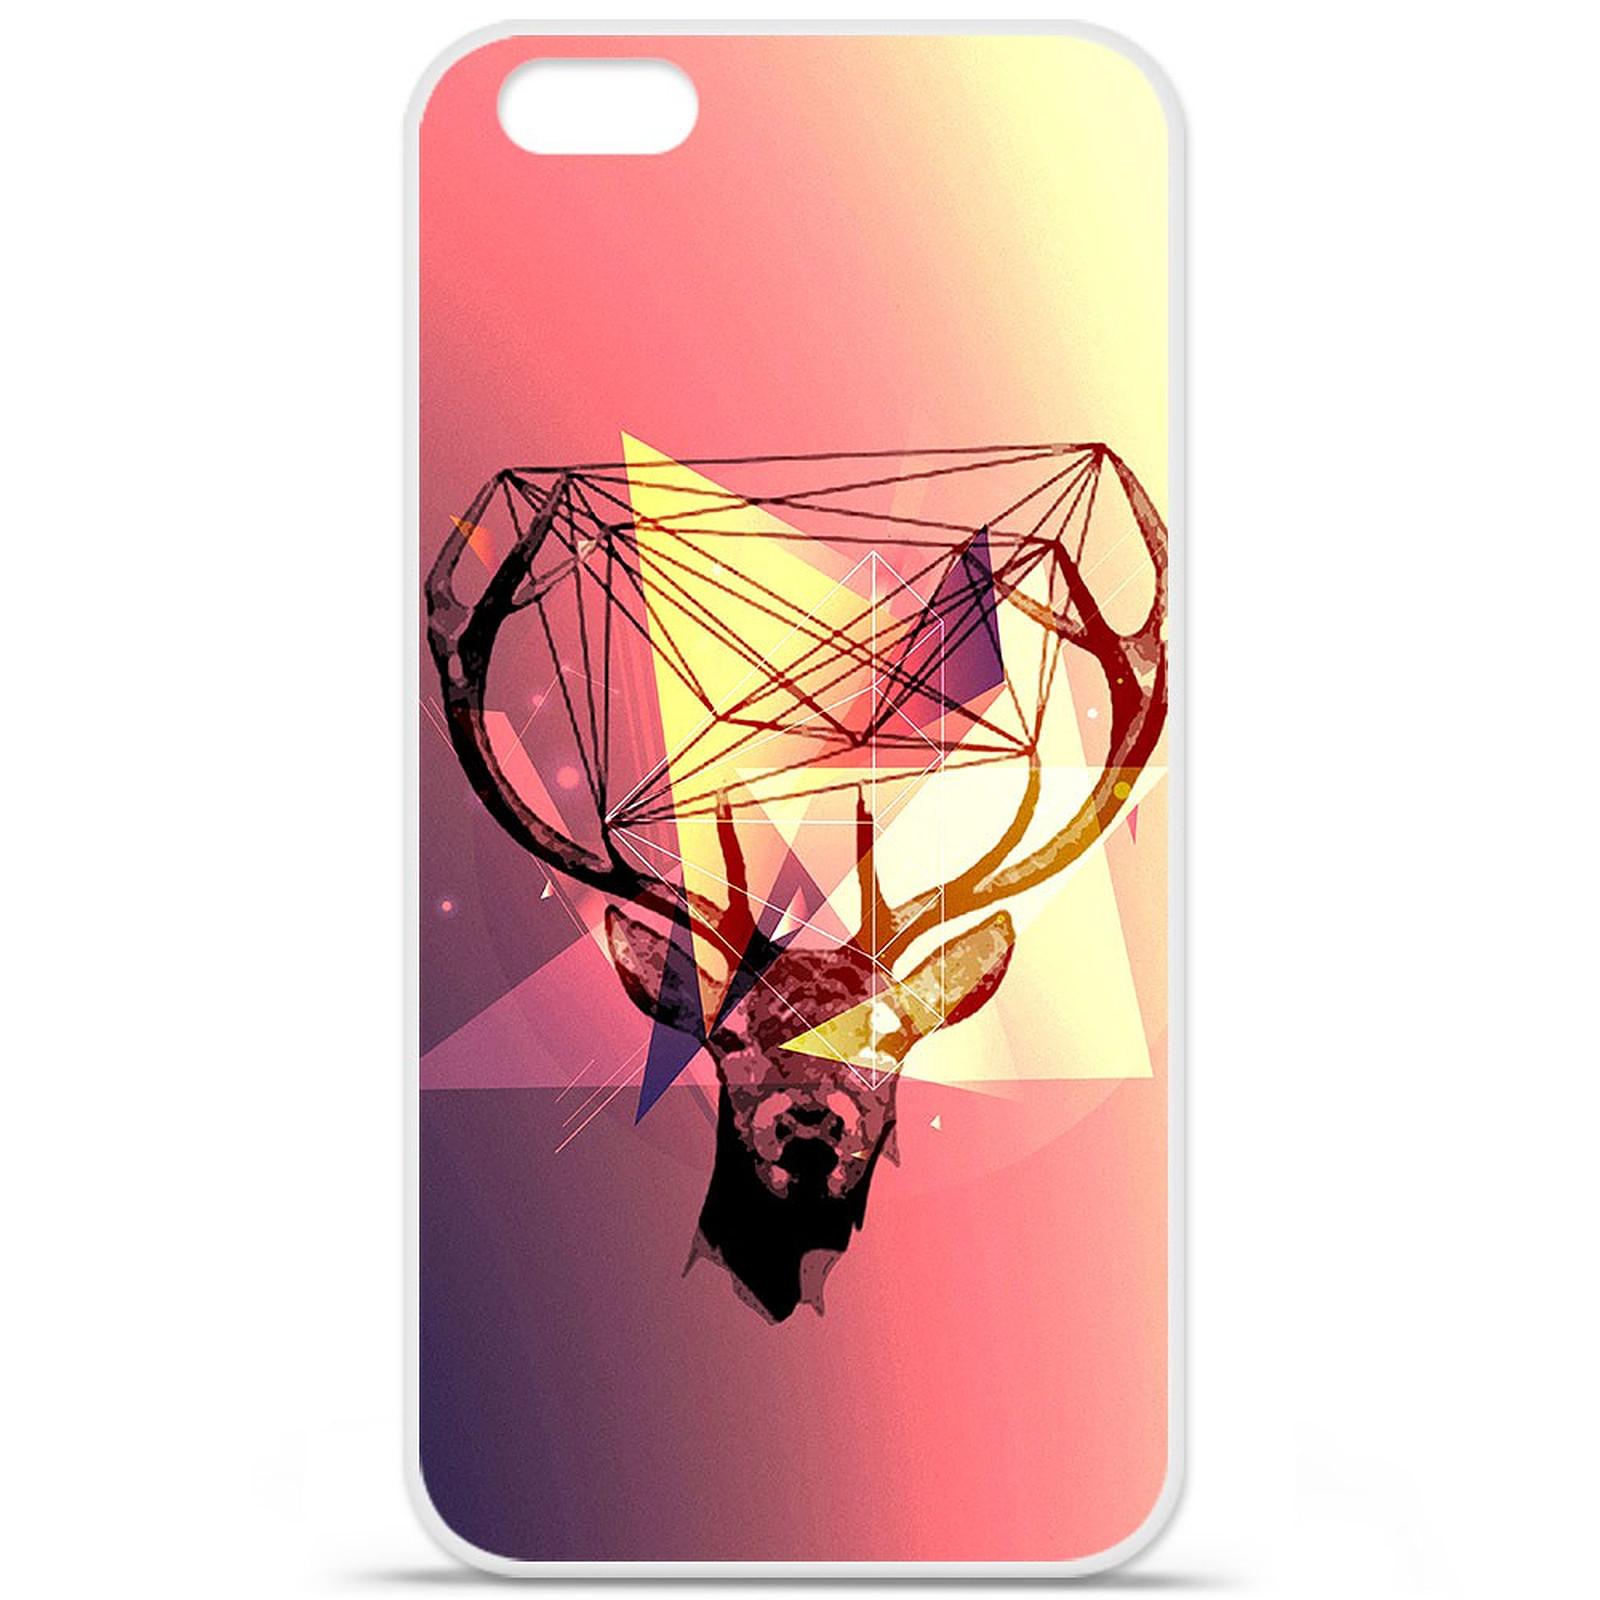 1001 Coques Coque silicone gel Apple IPhone 7 Plus motif Cerf Hipster